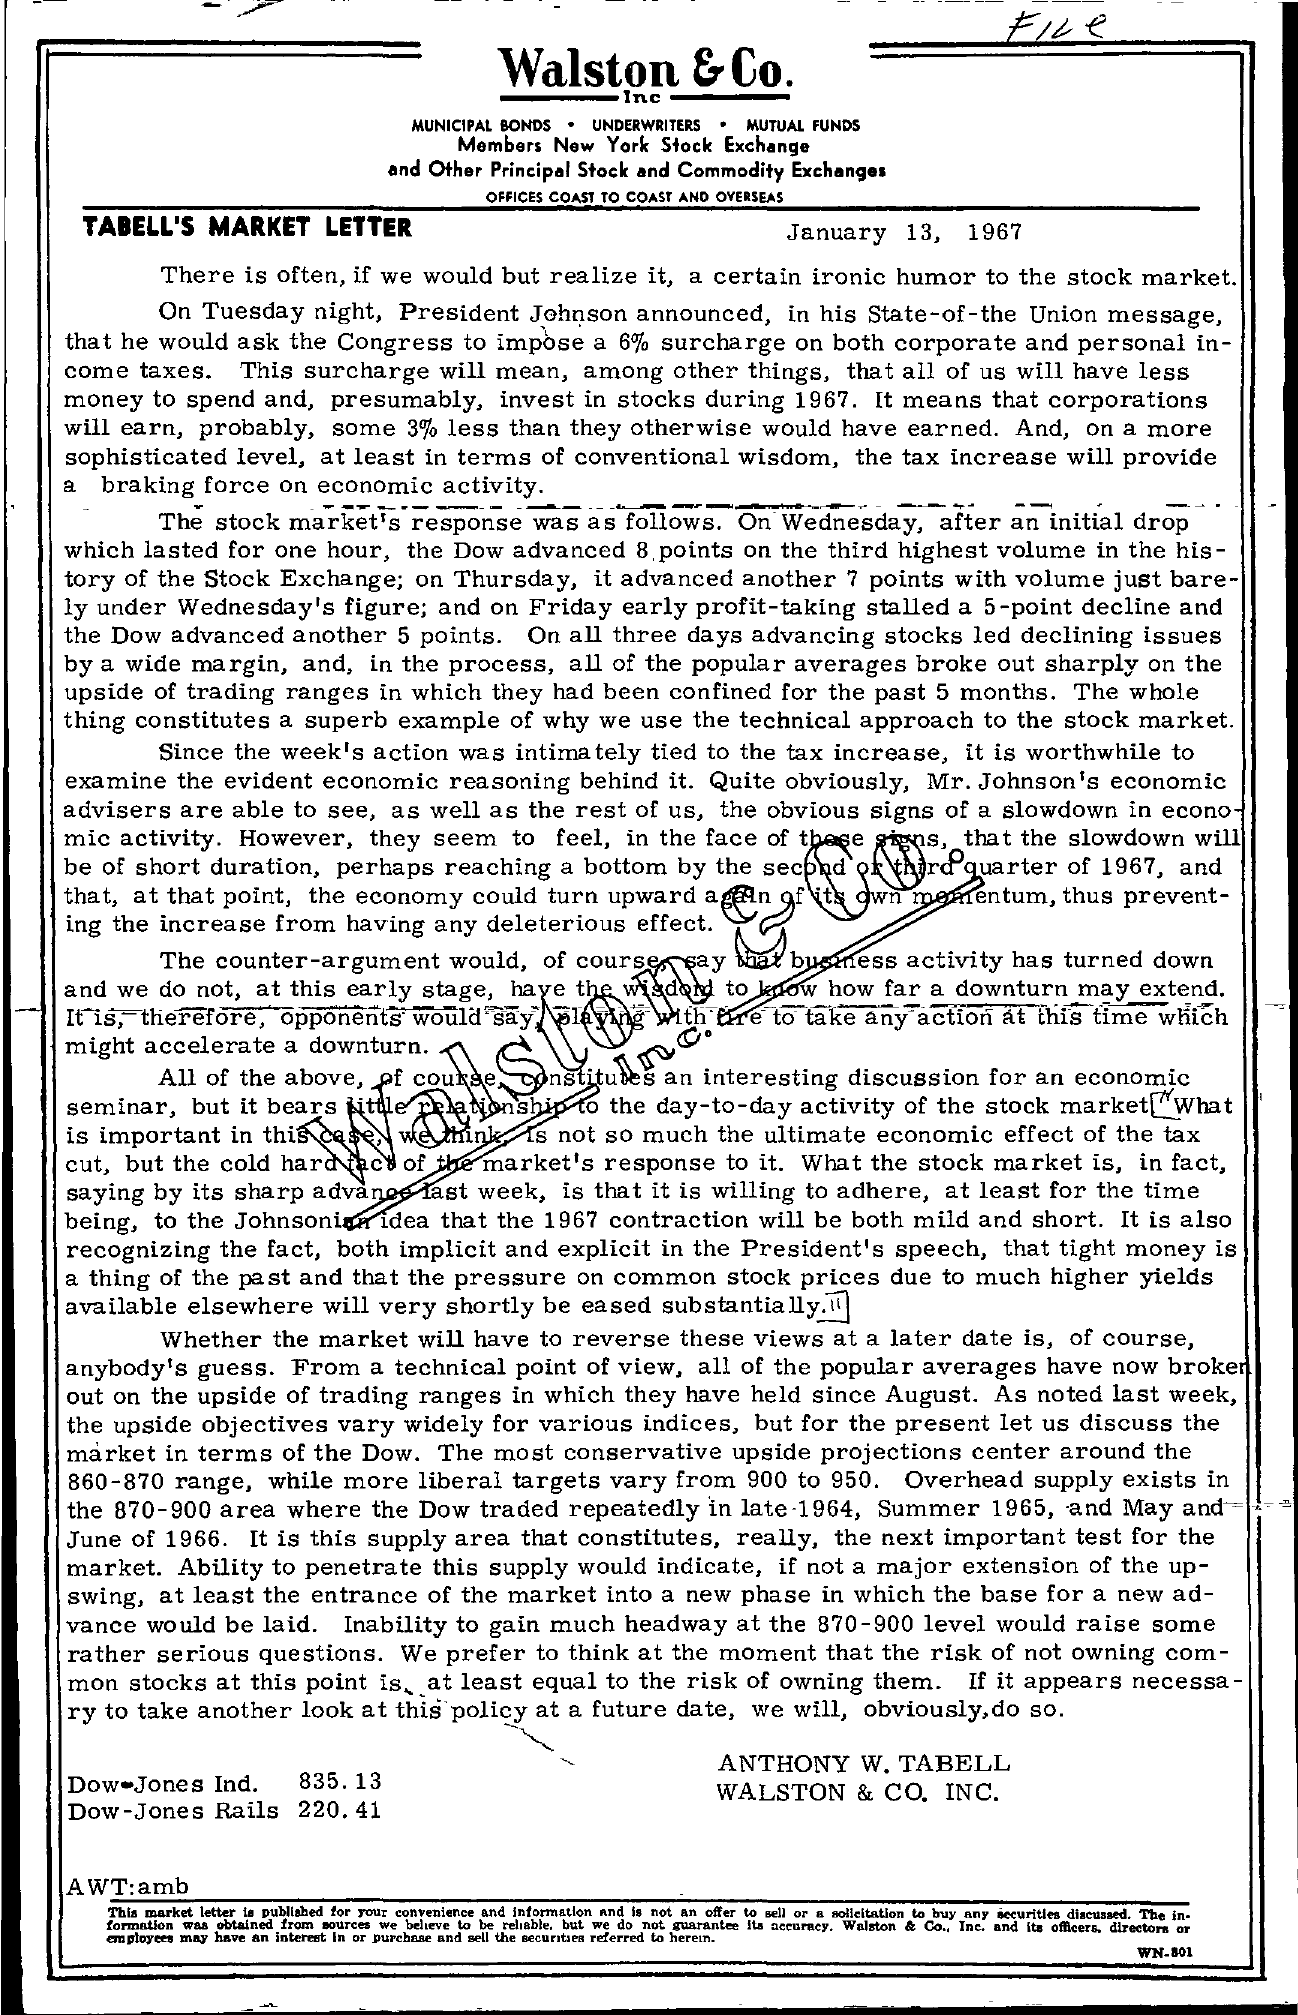 Tabell's Market Letter - January 13, 1967